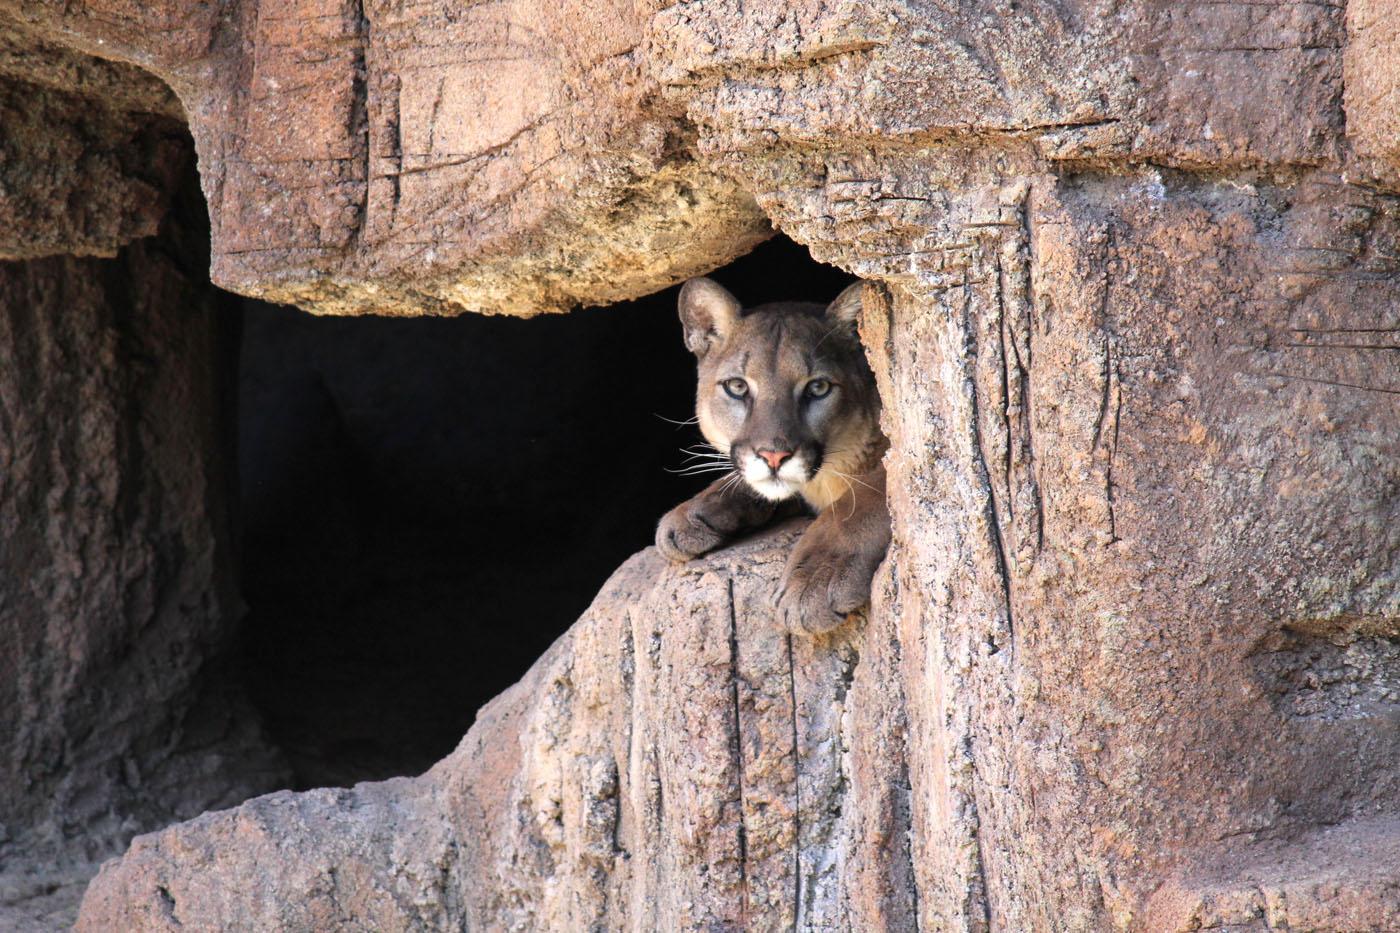 Mountain lion face close up - photo#18